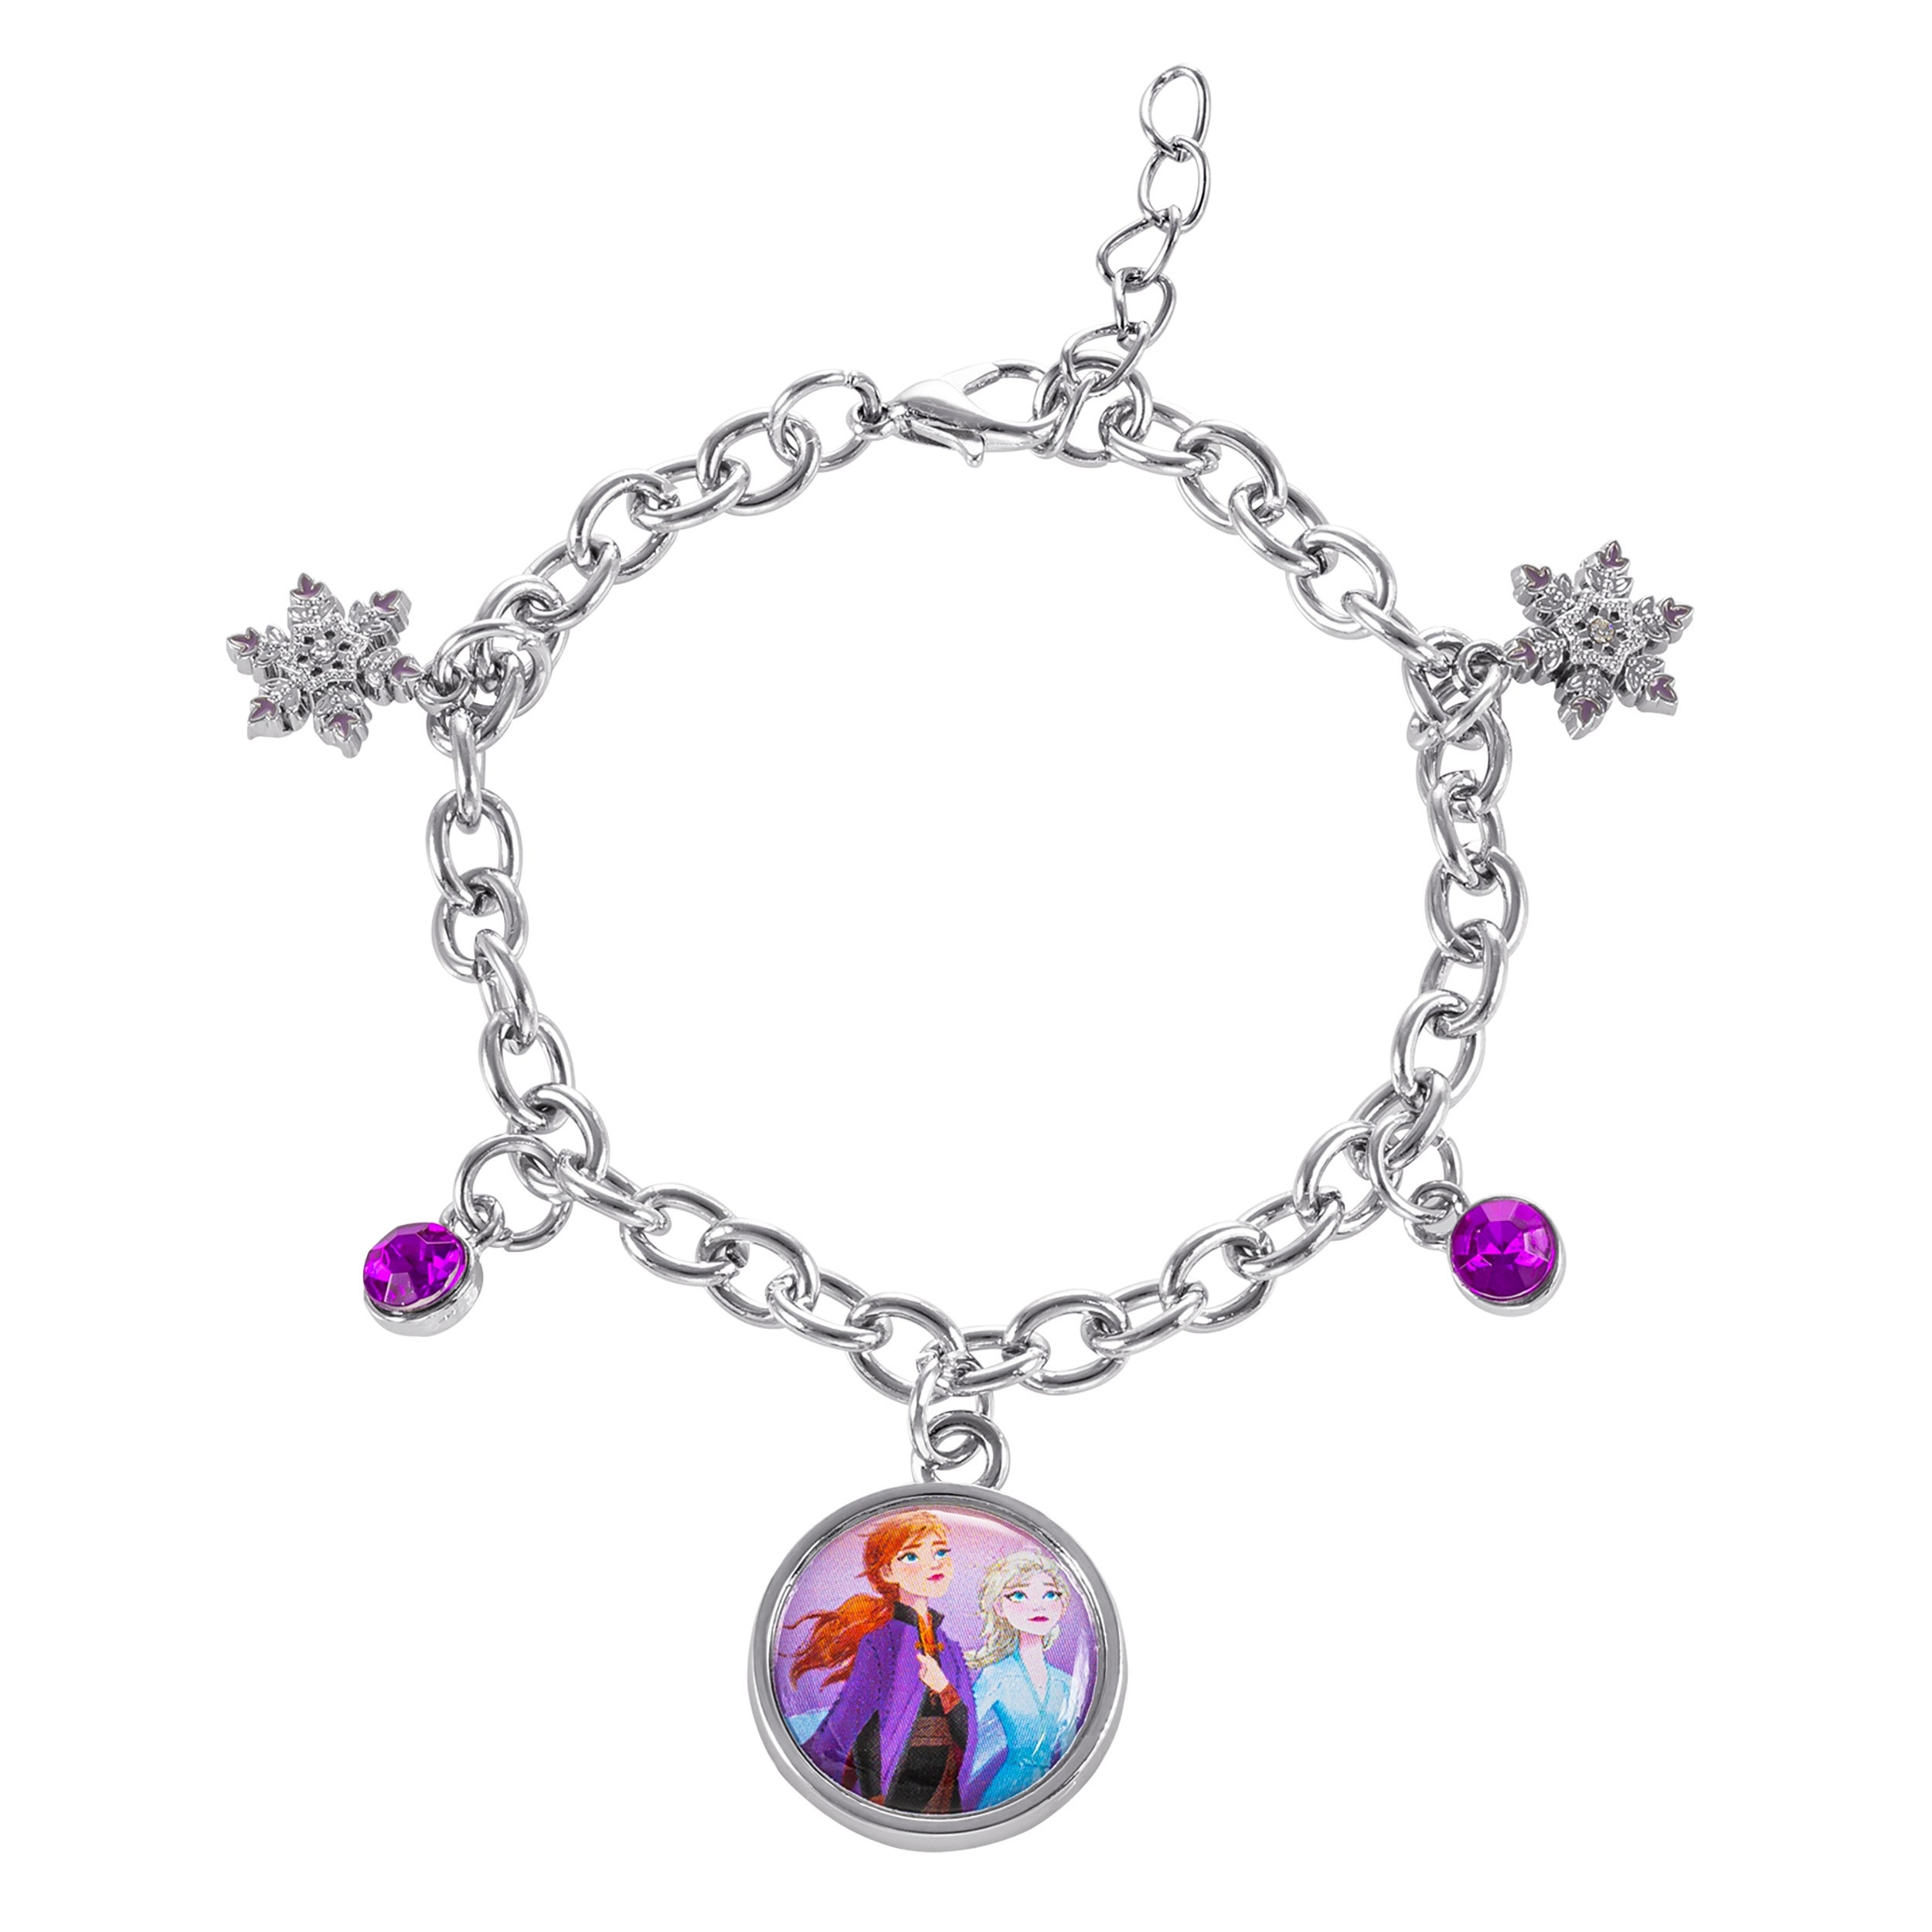 Wholesale Frozen Jewelry Elsa  Bracelets 5pcs For Birth Day Gift